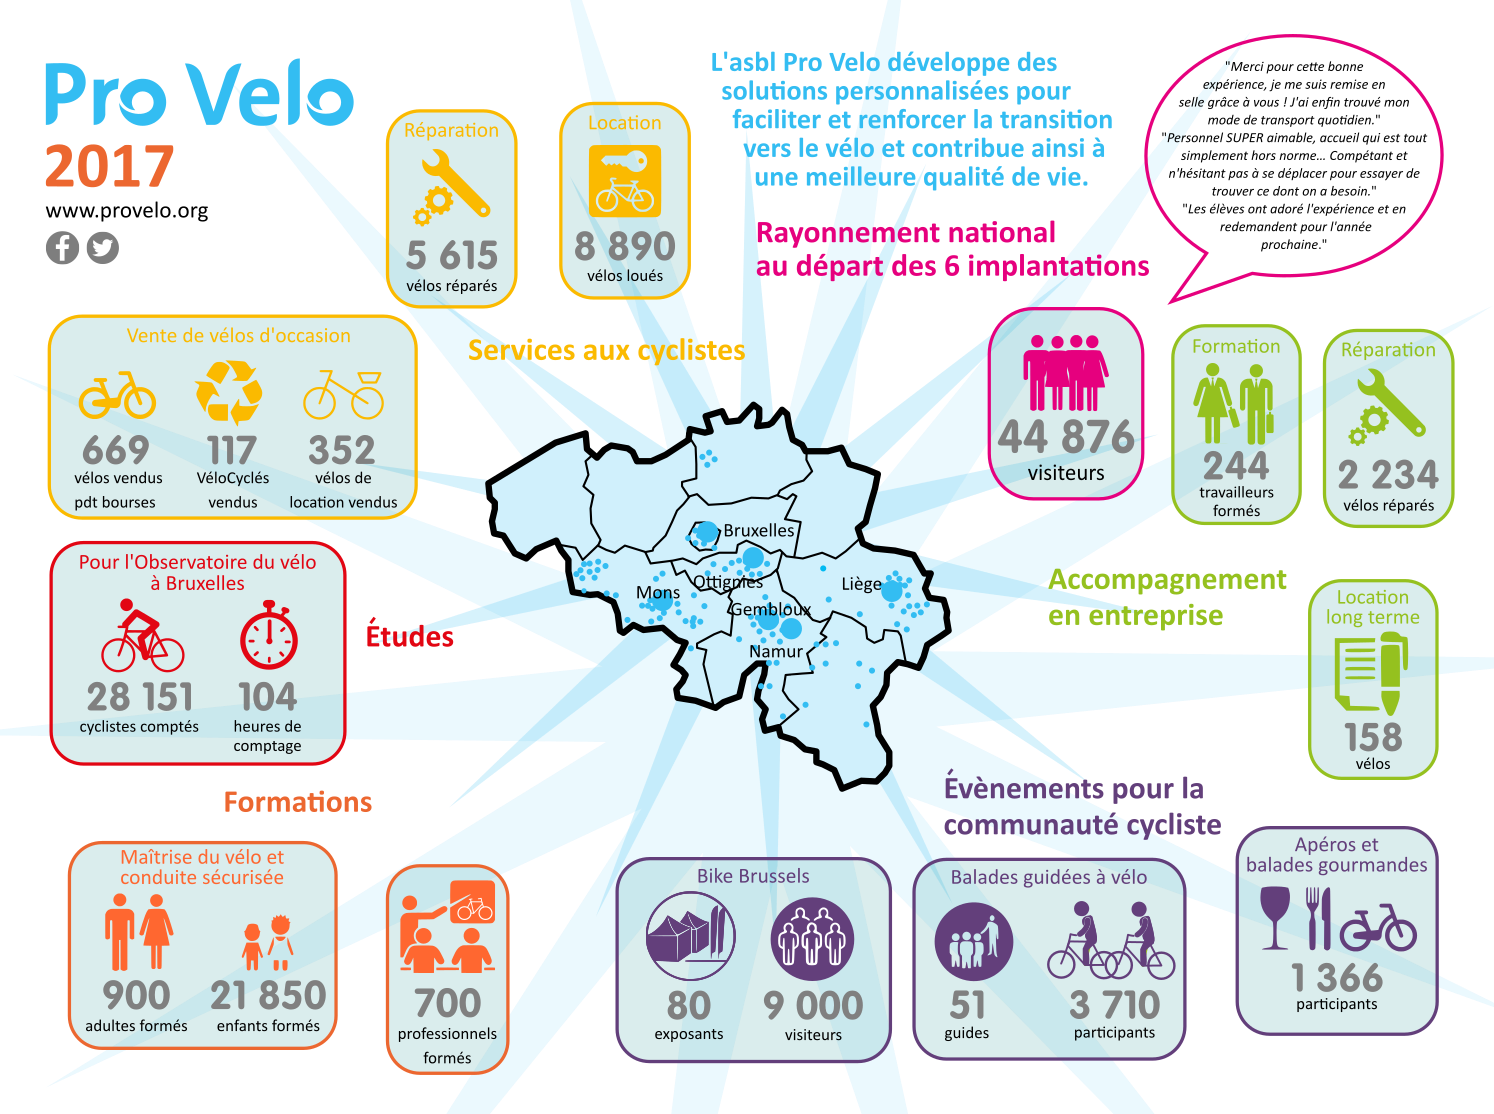 Pro Velo rapport 2017